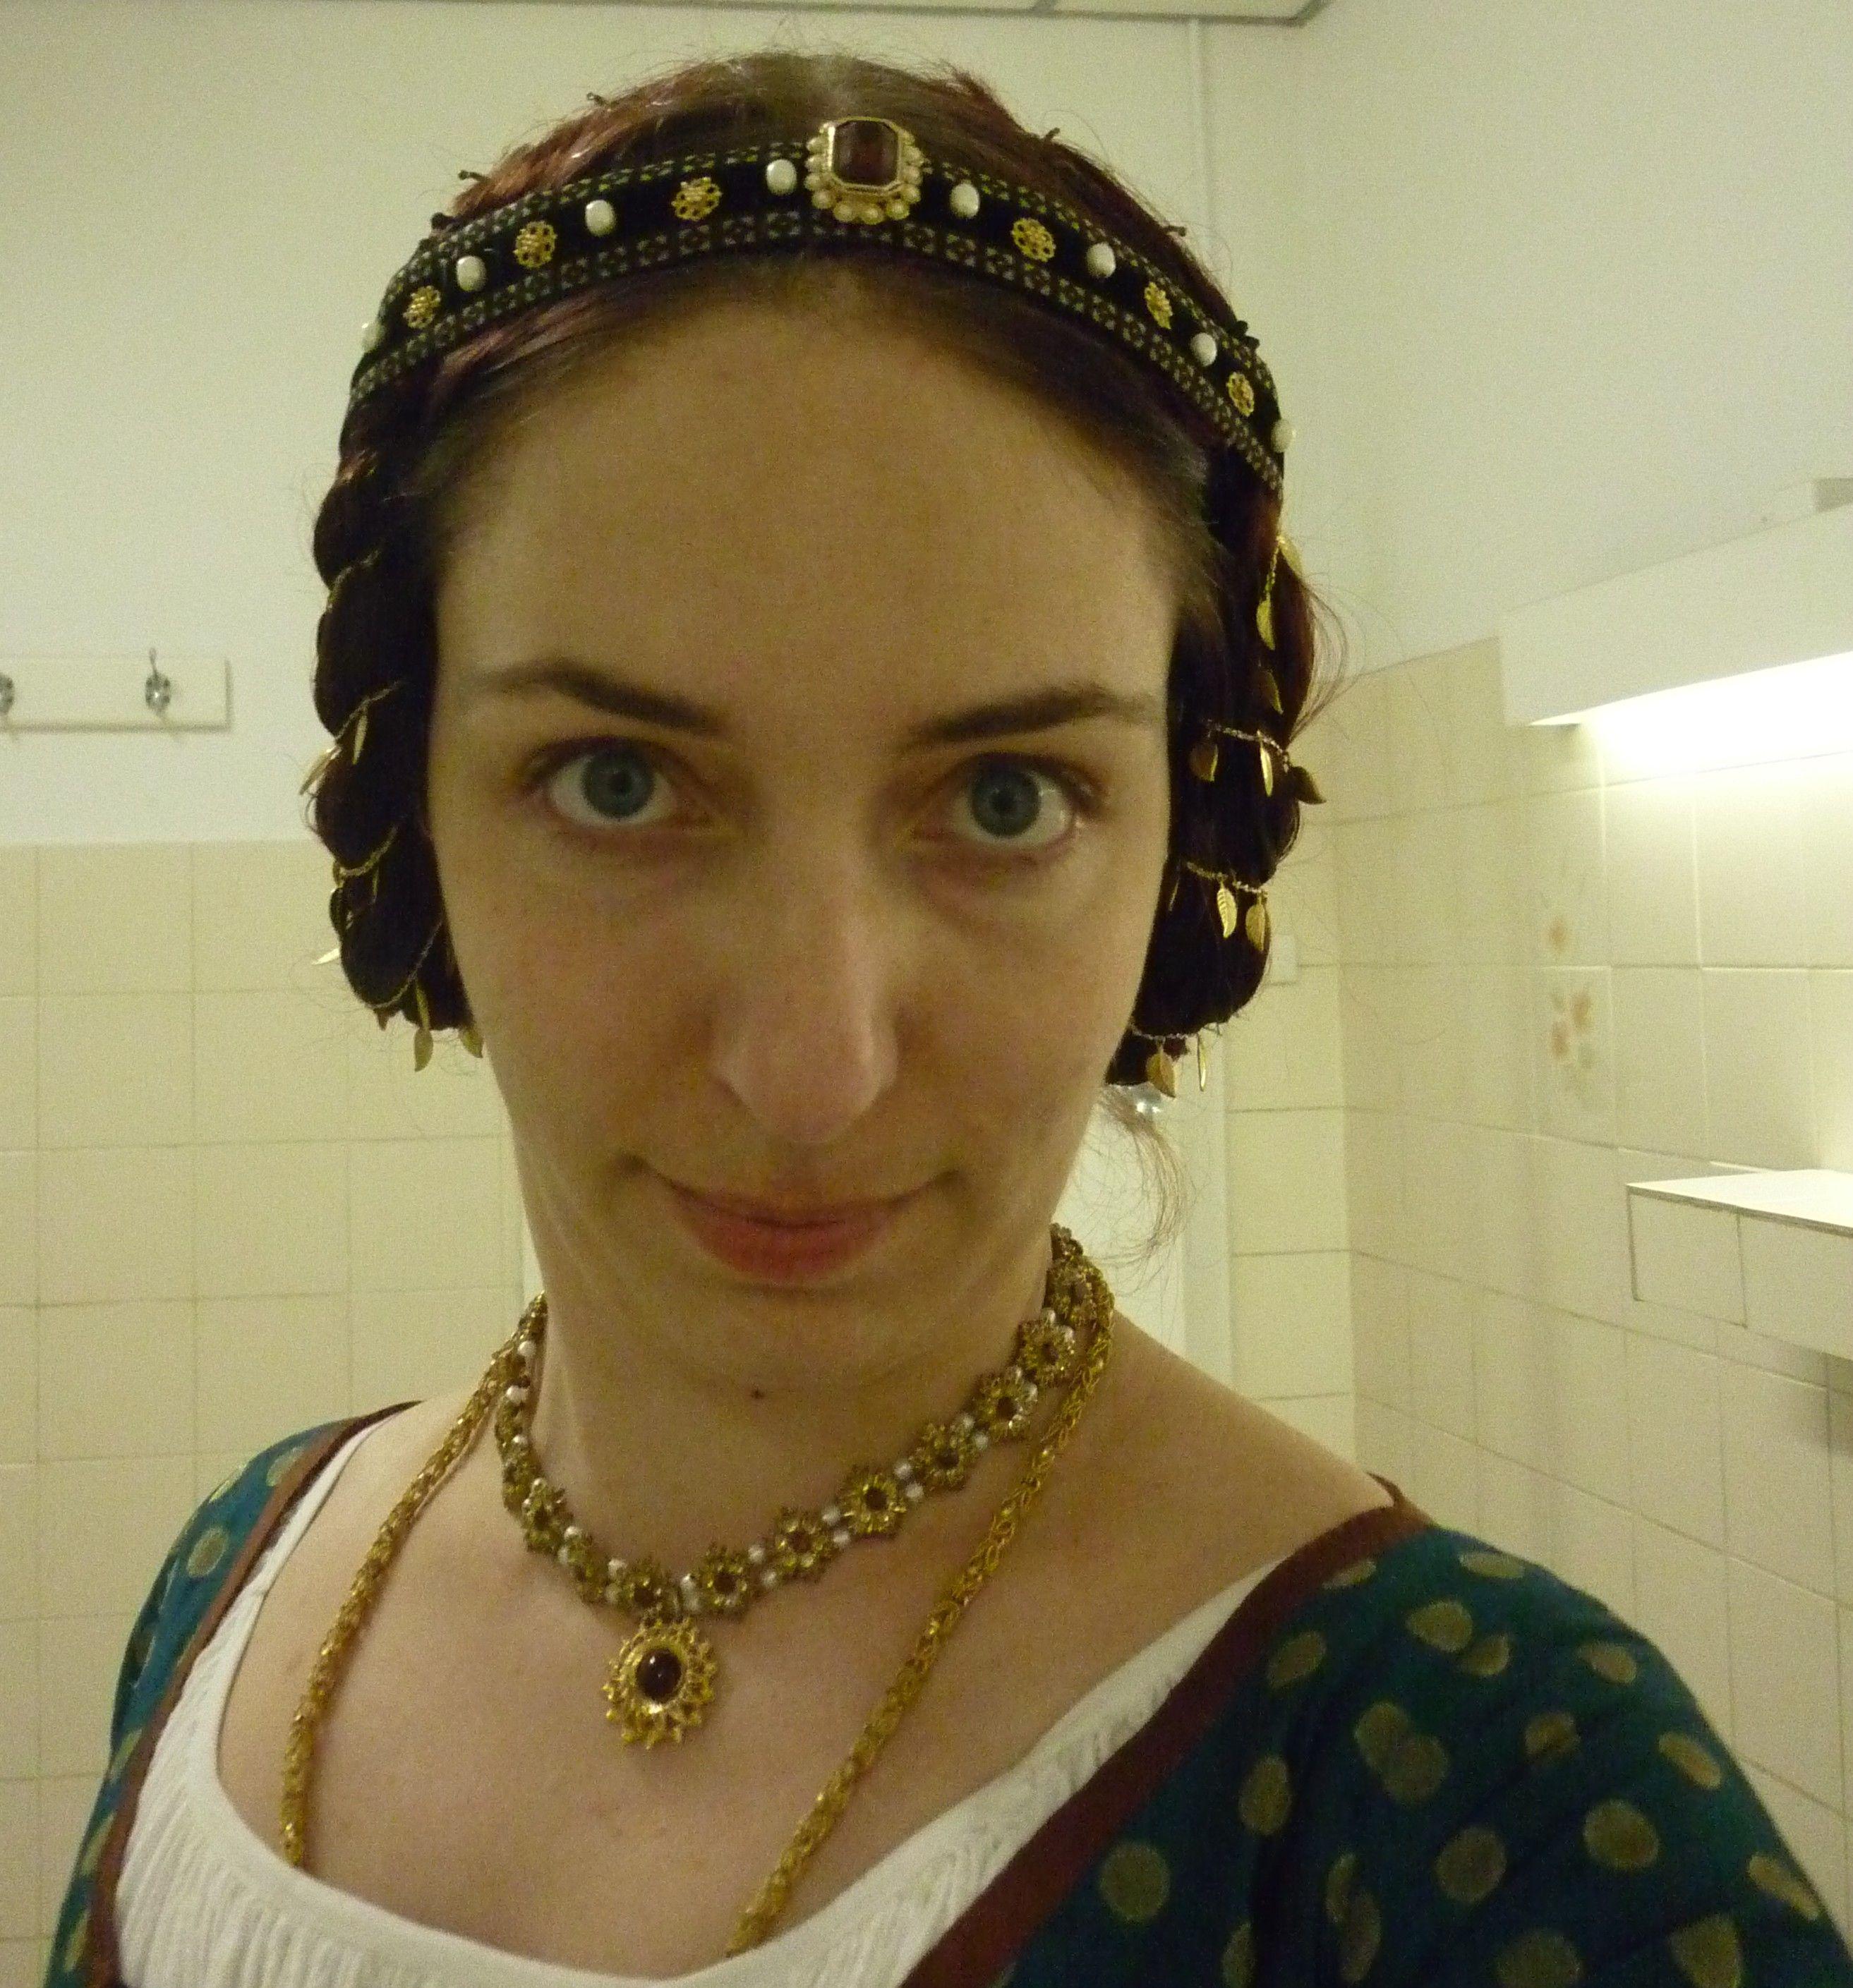 Hair Details A La Late 15th Century German Renaissance From The Blog Garb Related Chaos Fake Hair Braids Hair Today Fake Hair